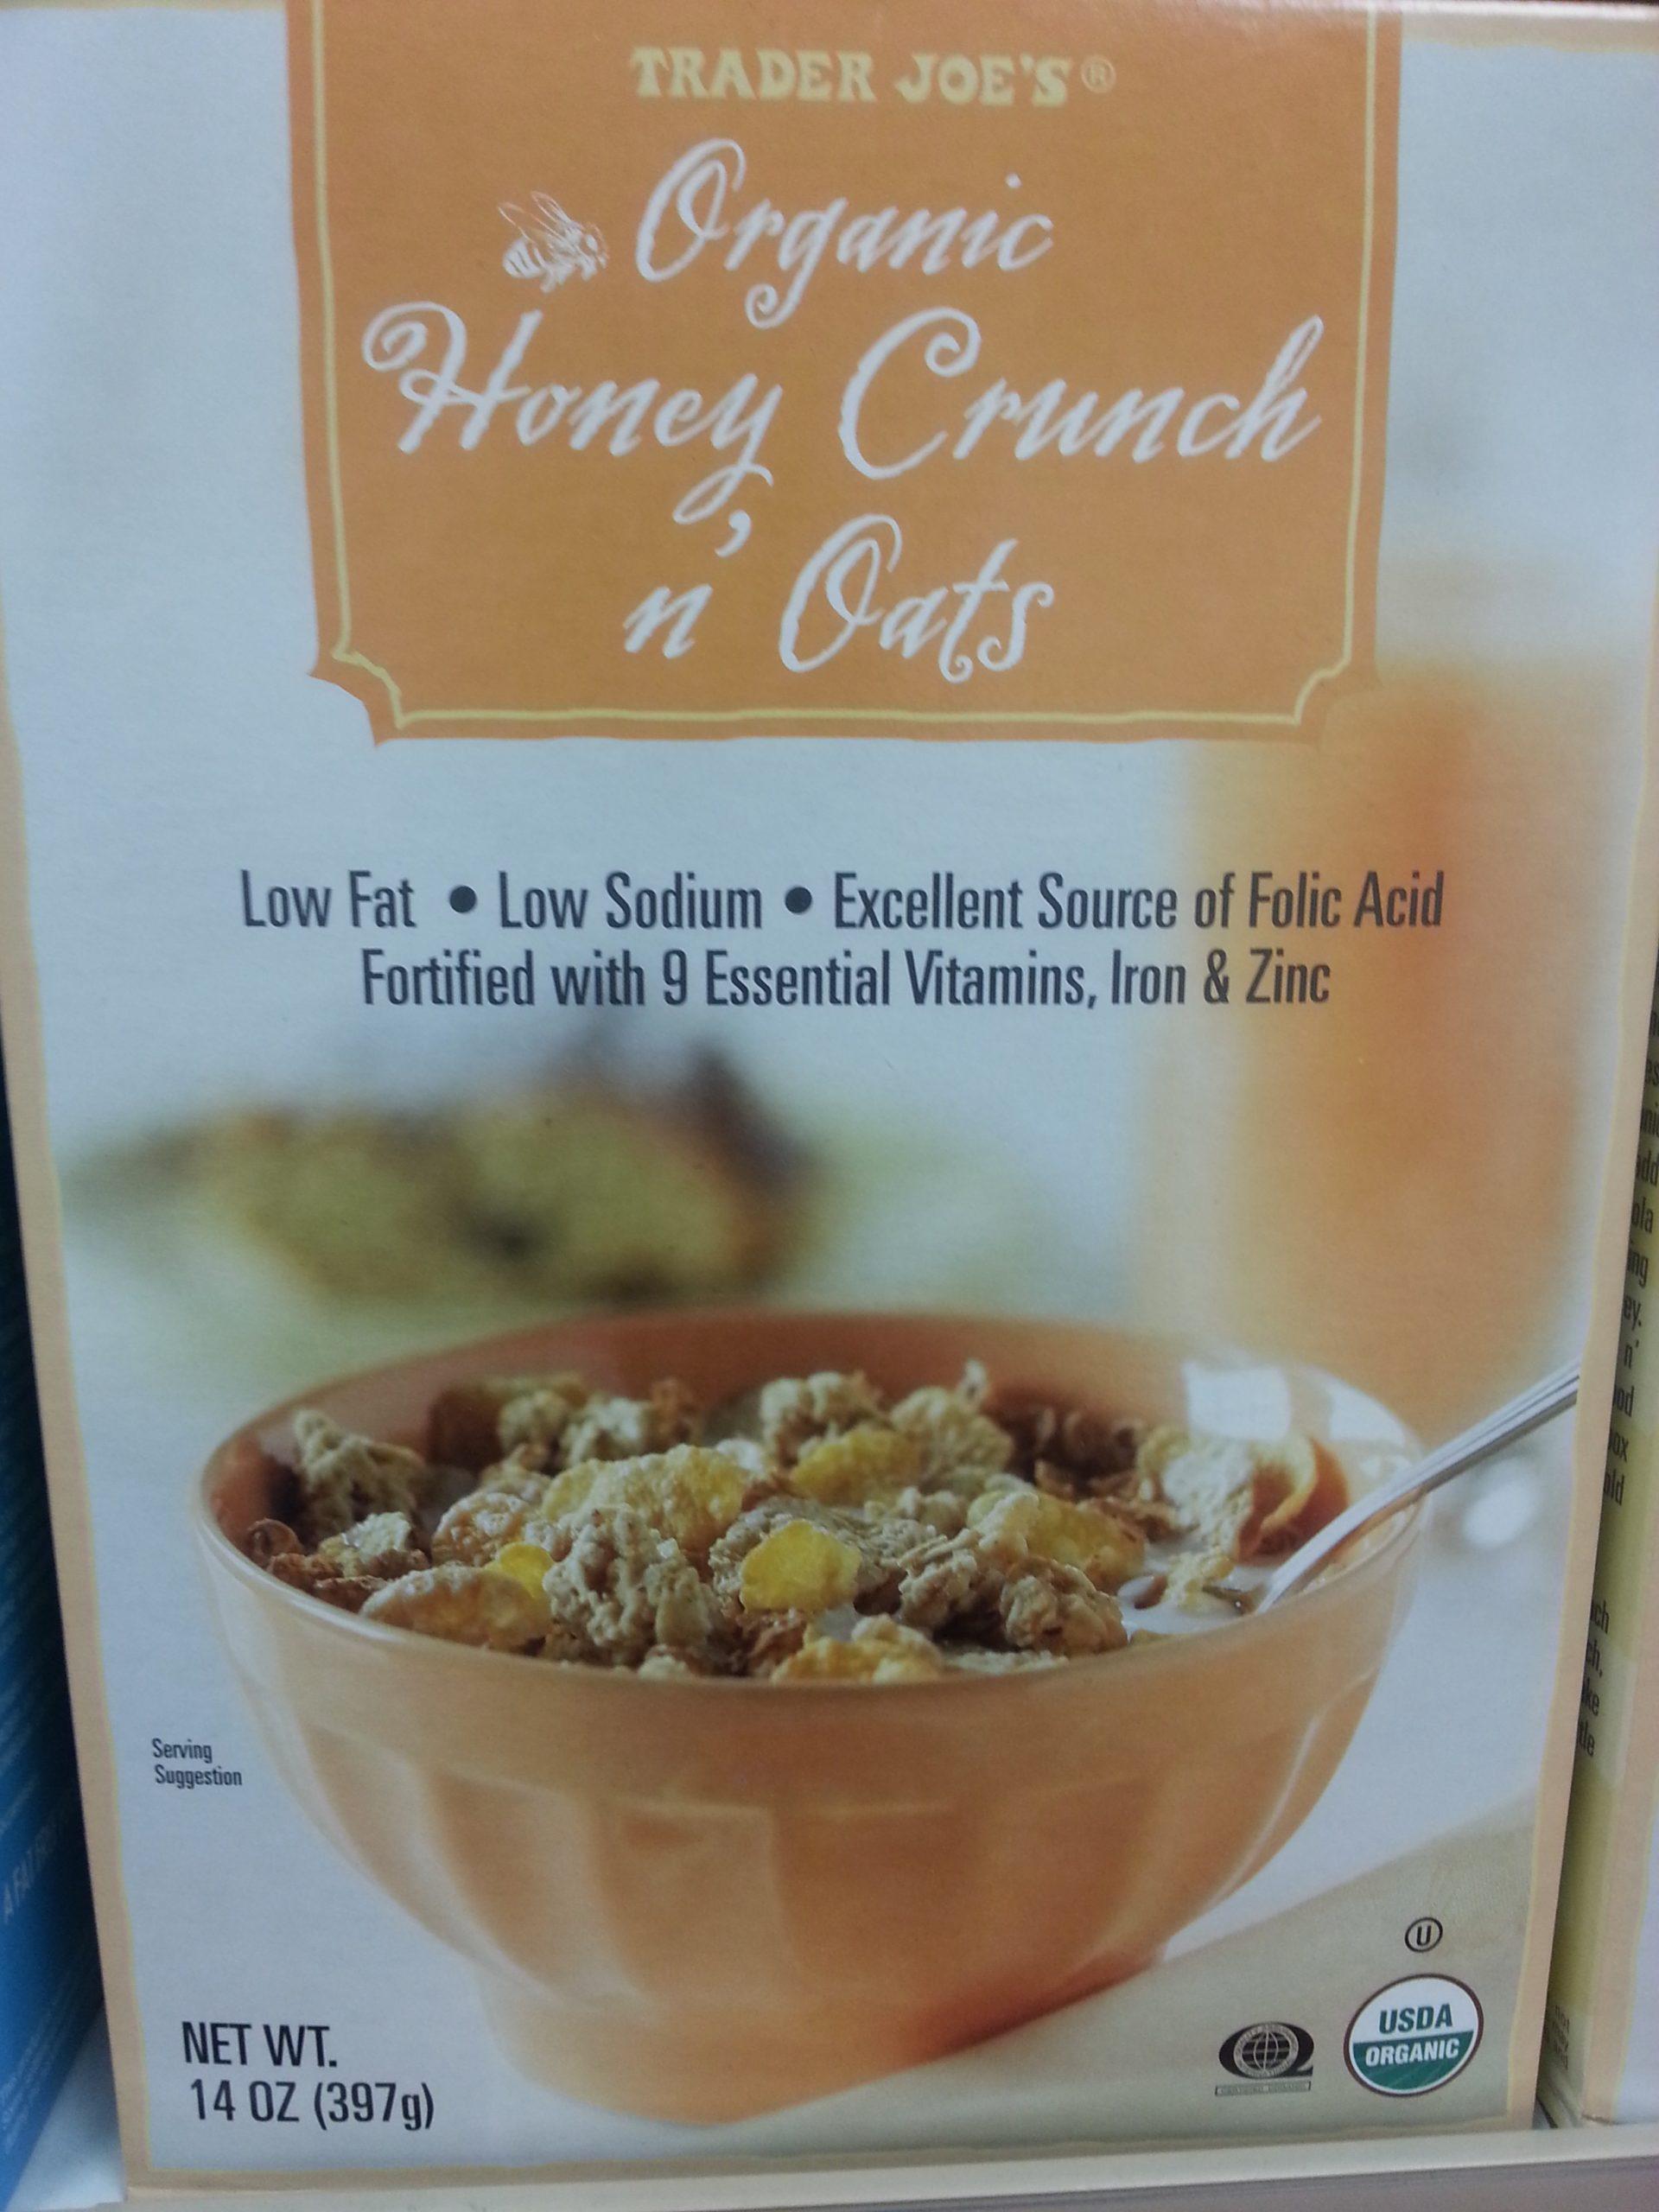 Trader Joe's Organic Honey Crunch n' Oats Reviews